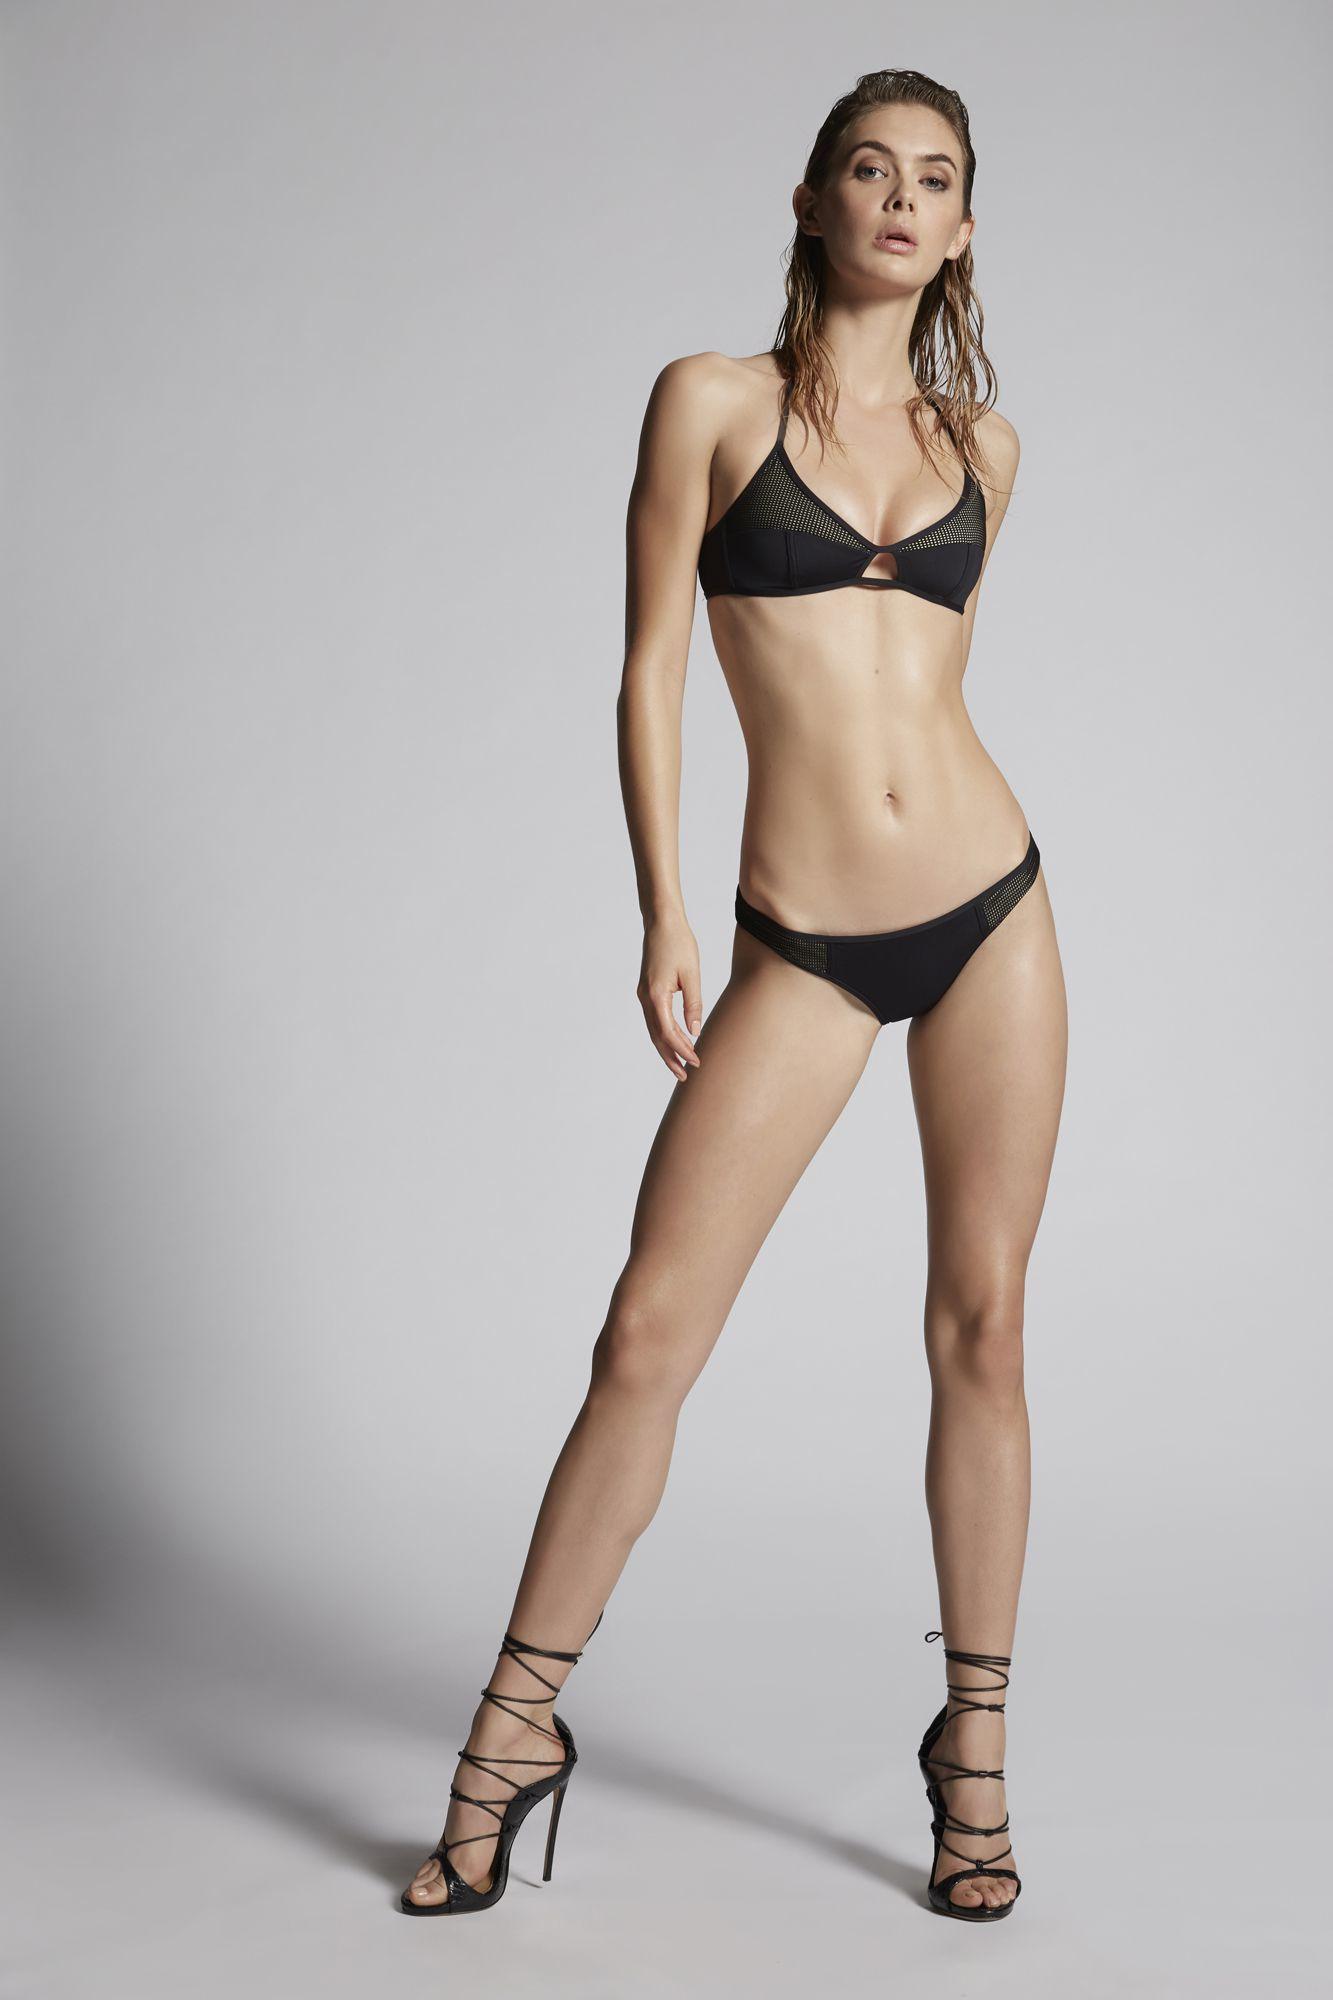 Megan-Williams(2)-Feet-3397390.jpg